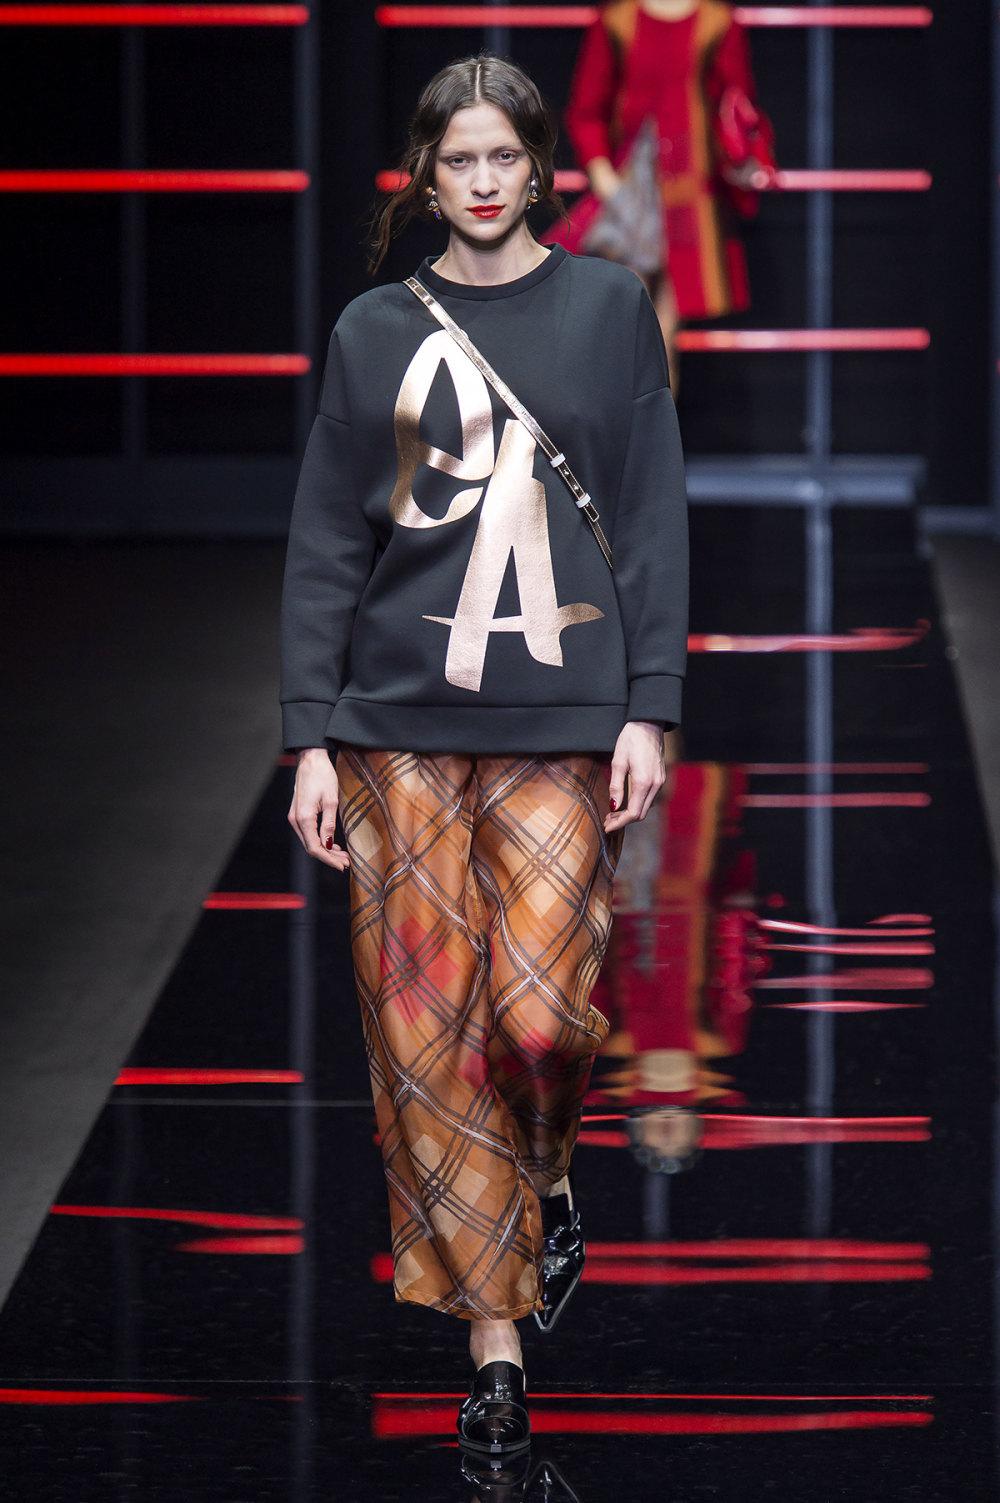 Emporio Armani时装系列畅的裤子带有柔滑裙子的鸡尾酒礼服-9.jpg